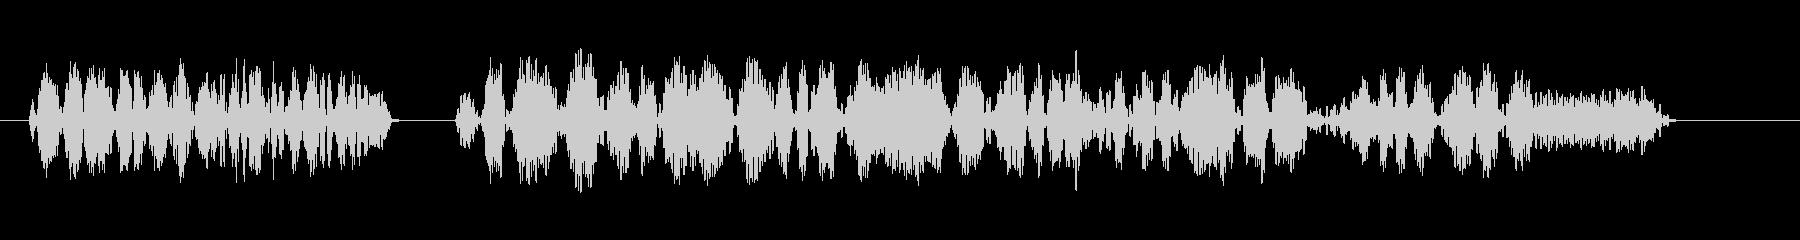 SciFi EC01_91_1の未再生の波形